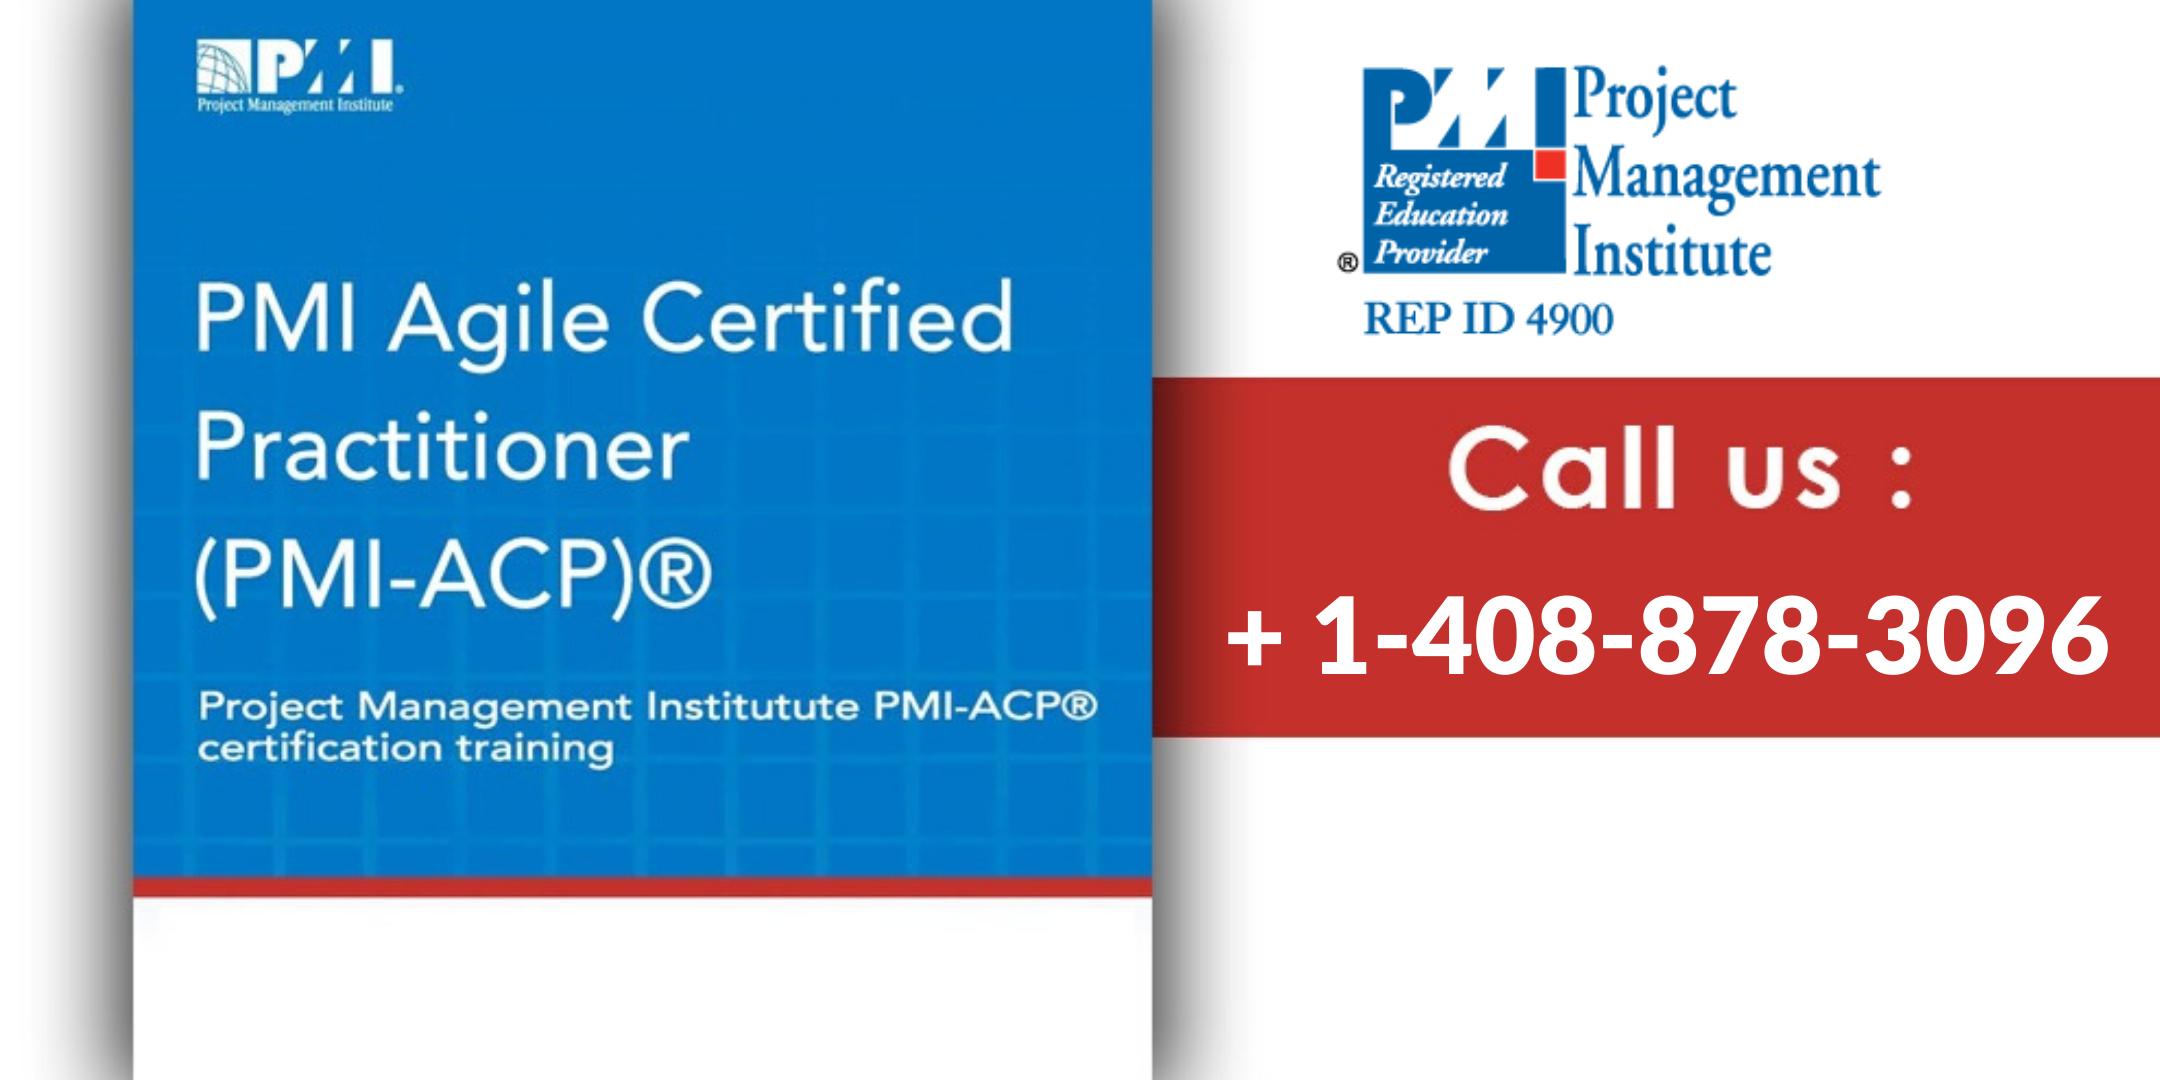 PMI-ACP (PMI Agile Certified Practitioner) Training in Winnipeg